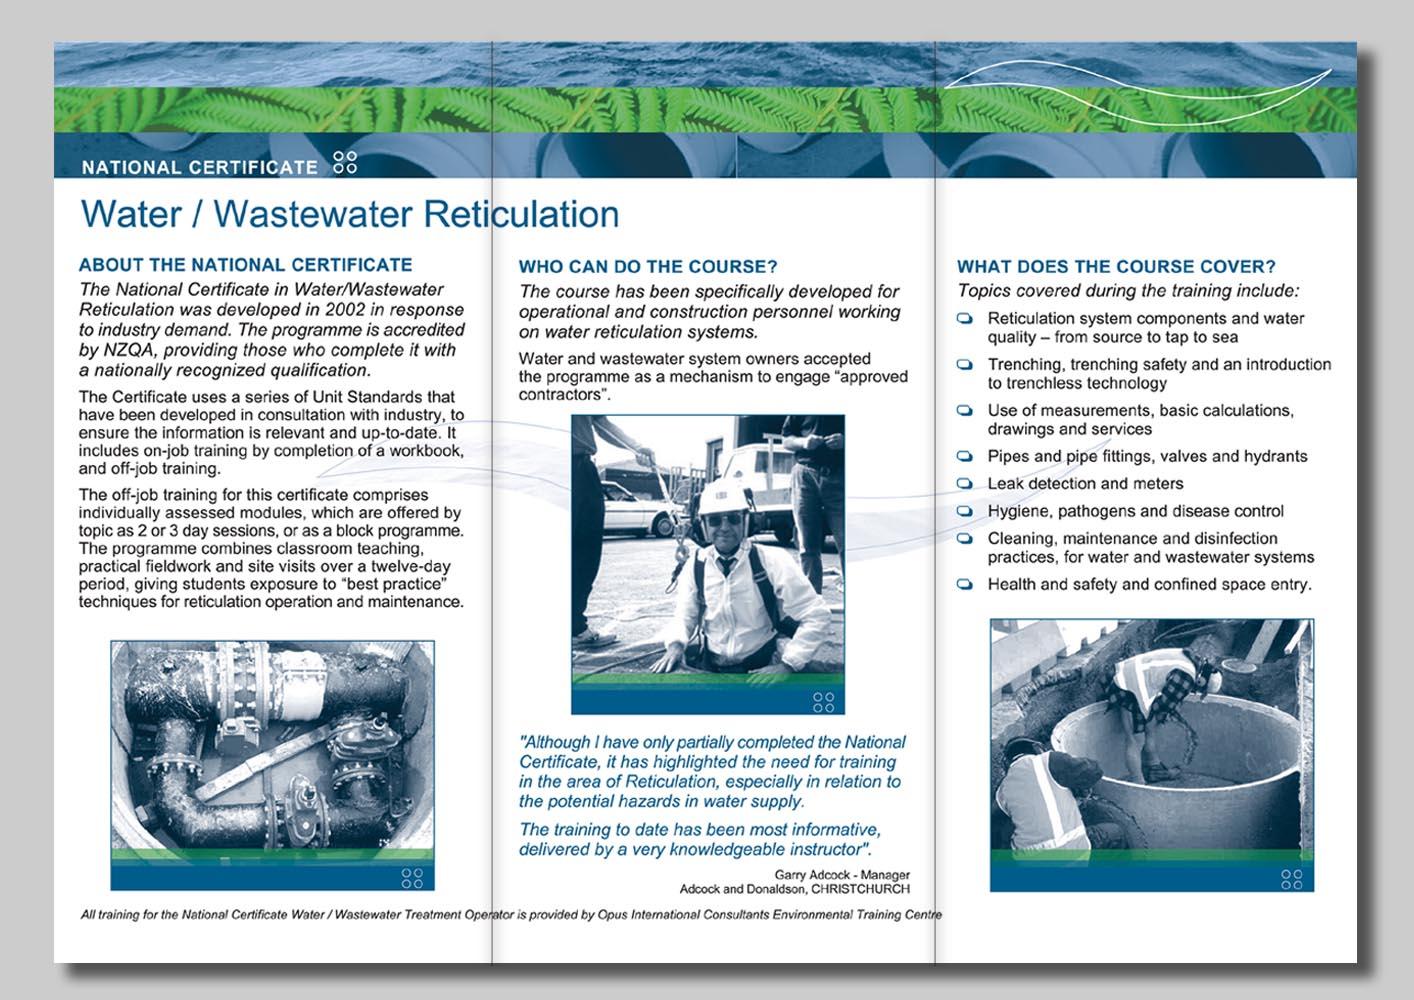 NZWETA Reticulation Brochure